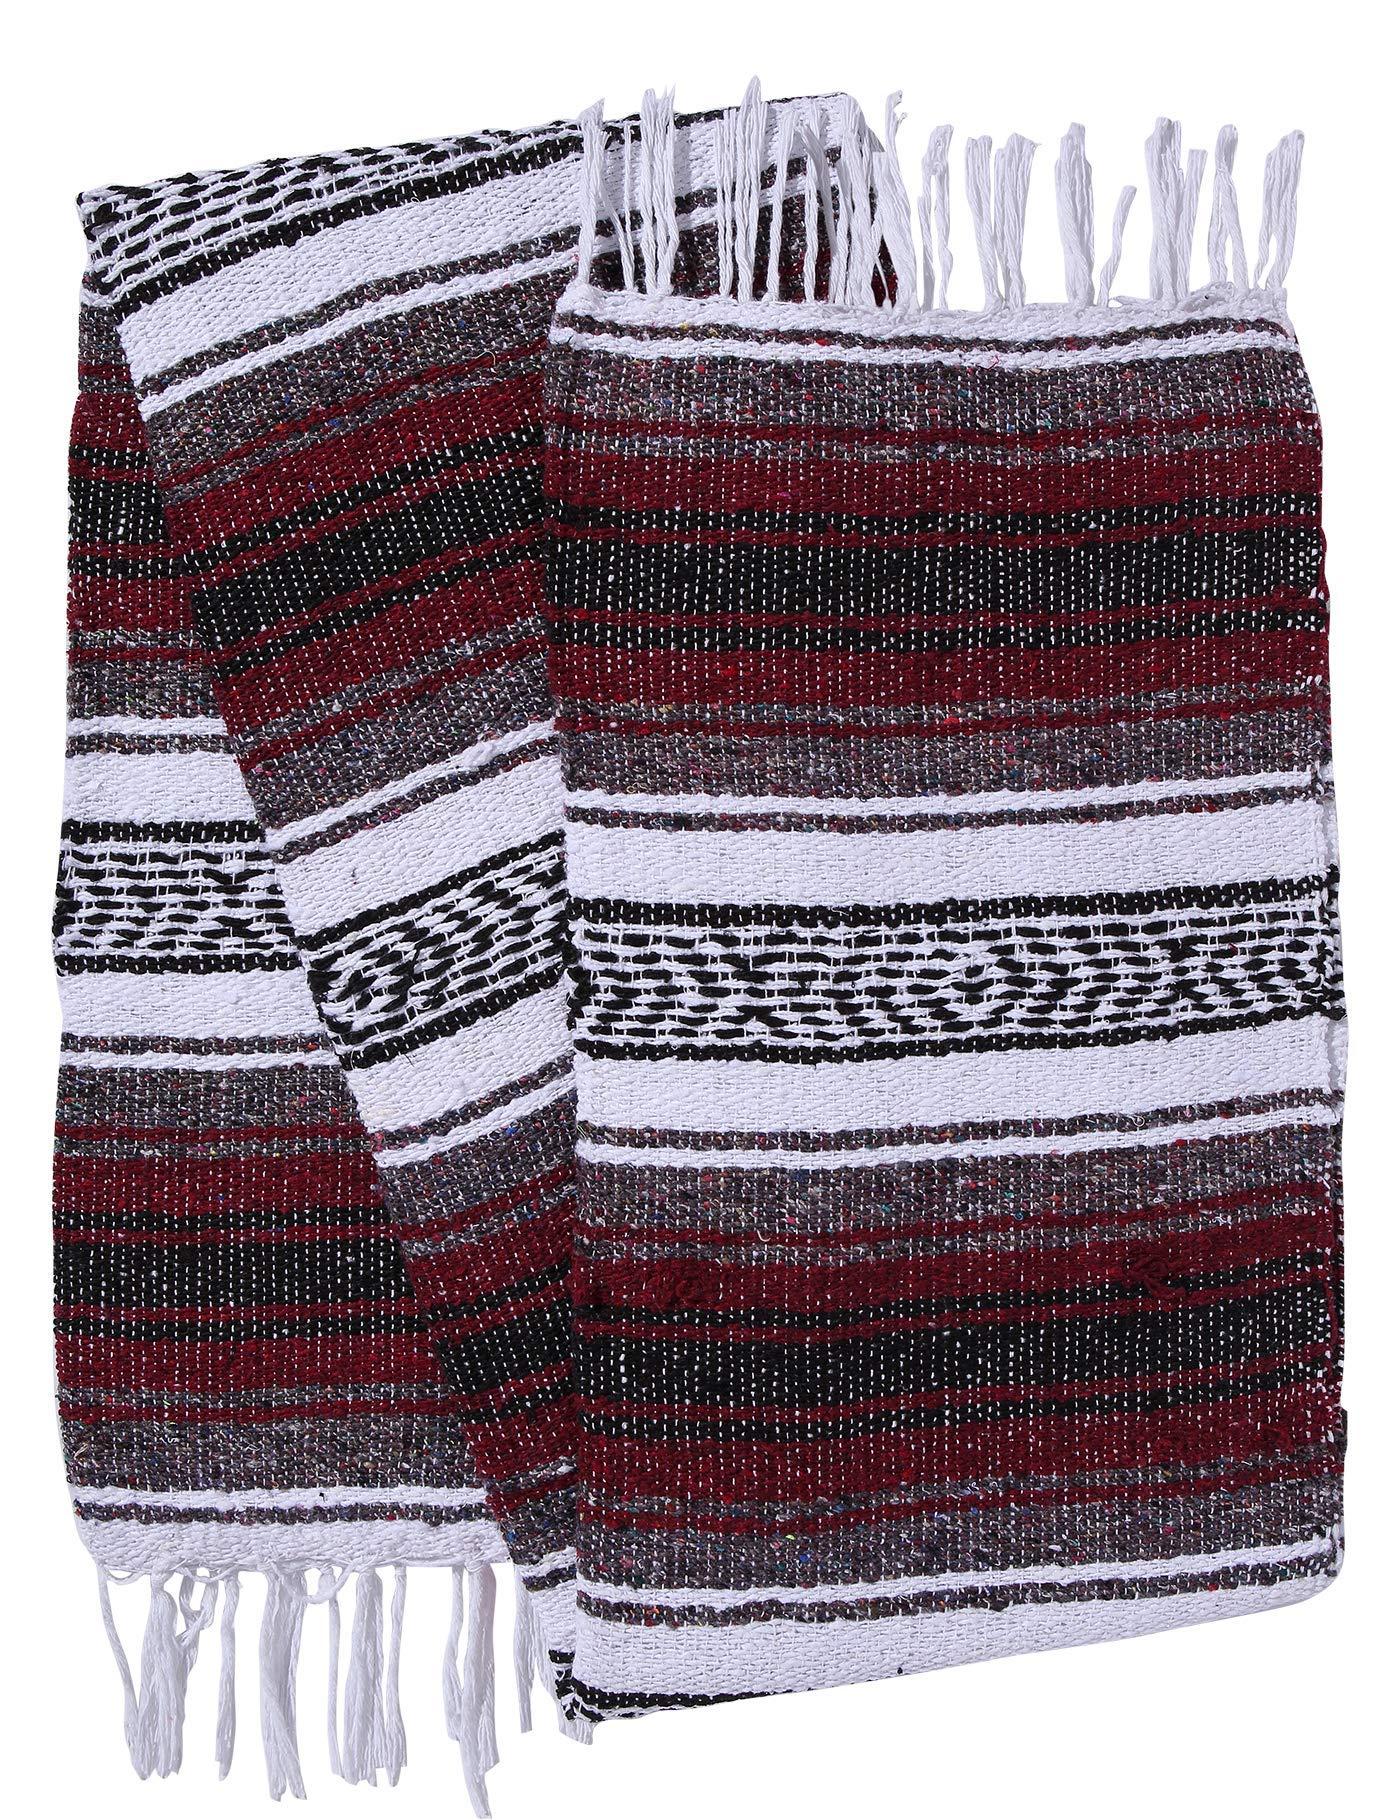 El Paso Designs Genuine Mexican Falsa Blanket - Yoga Studio Blanket, Colorful, Soft Woven Serape Imported from Mexico (Burgundy) by El Paso Designs (Image #3)